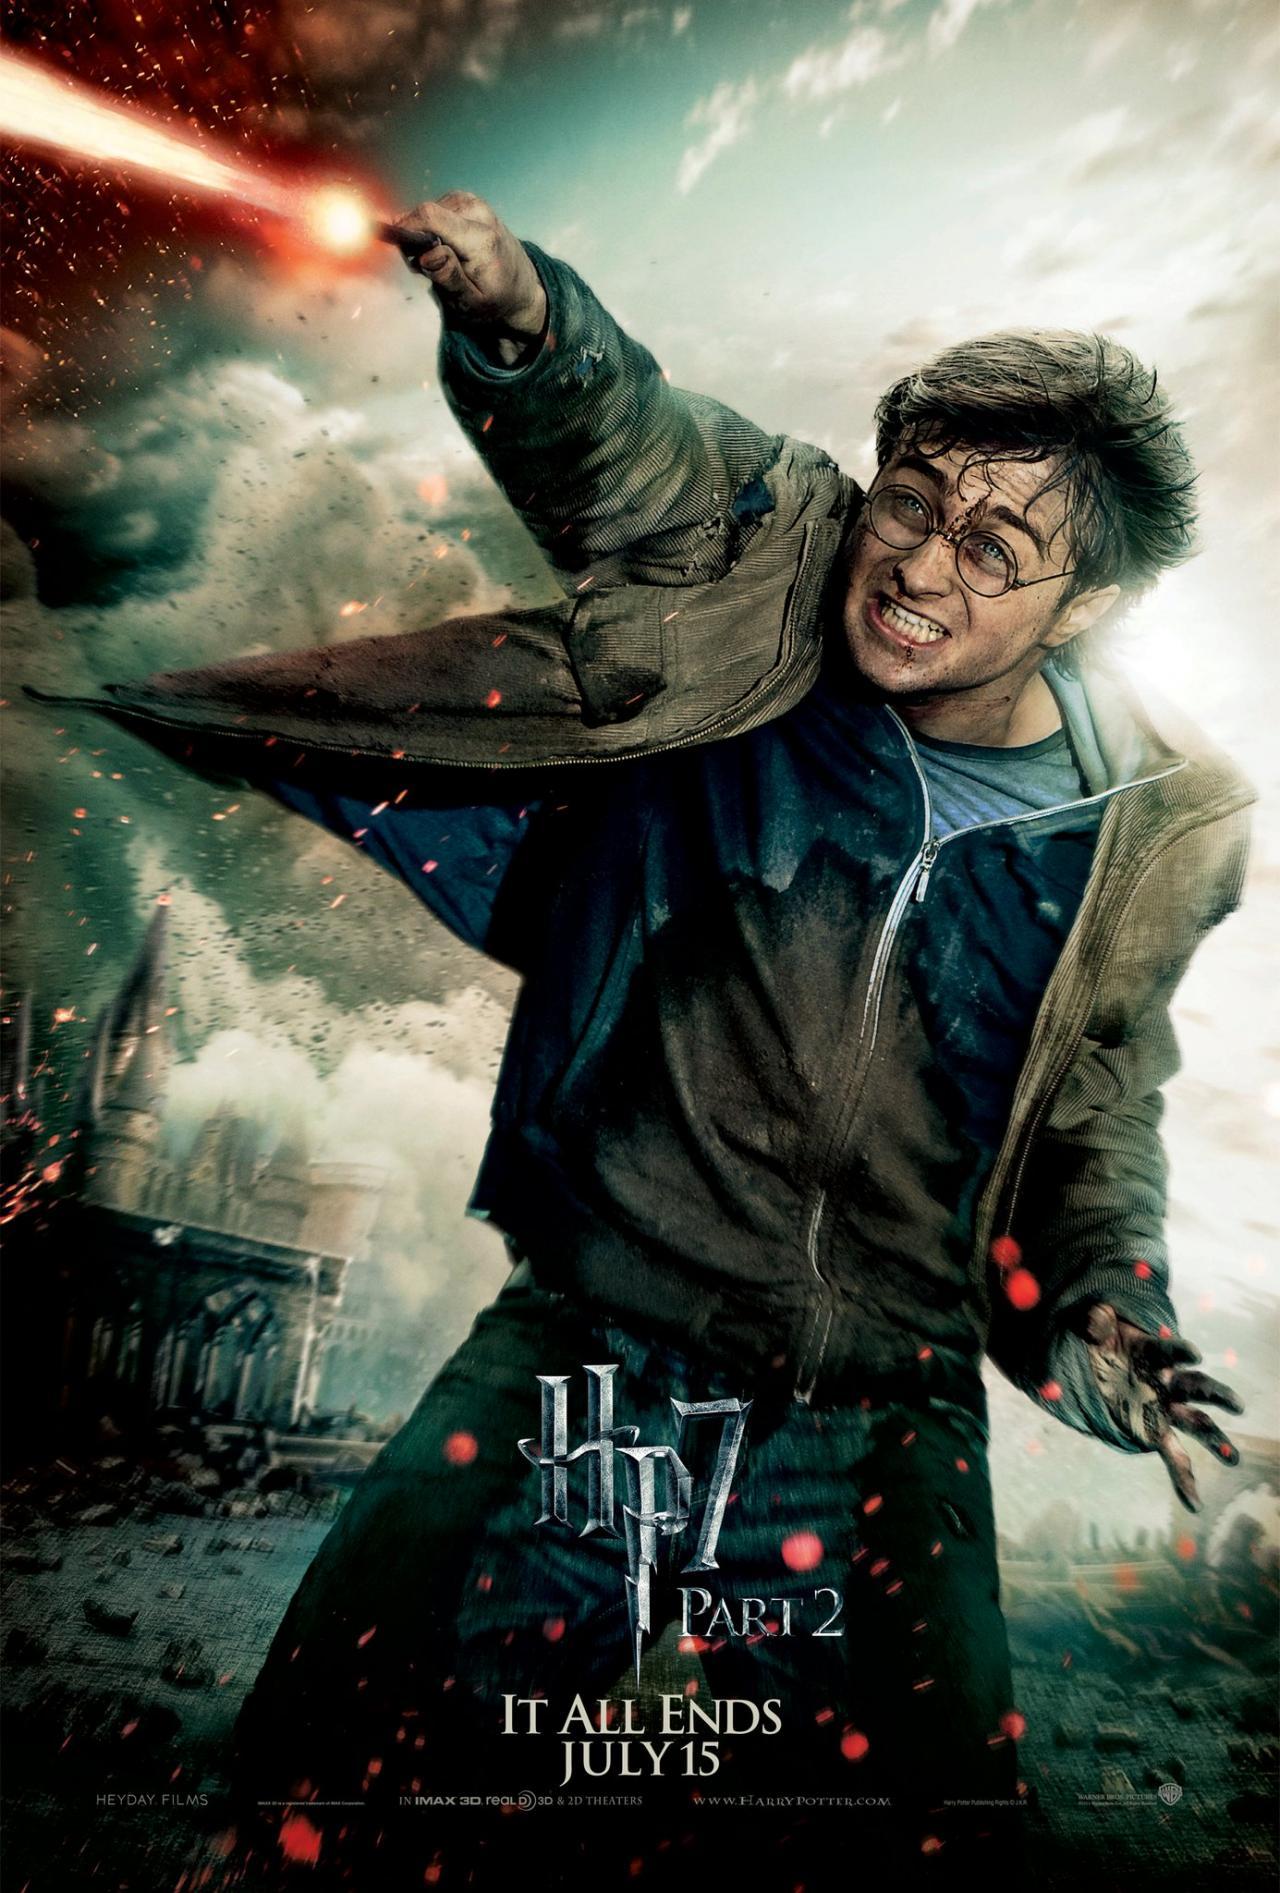 Wallpaper Harry Potter HP7 Part 2 poster - Harry